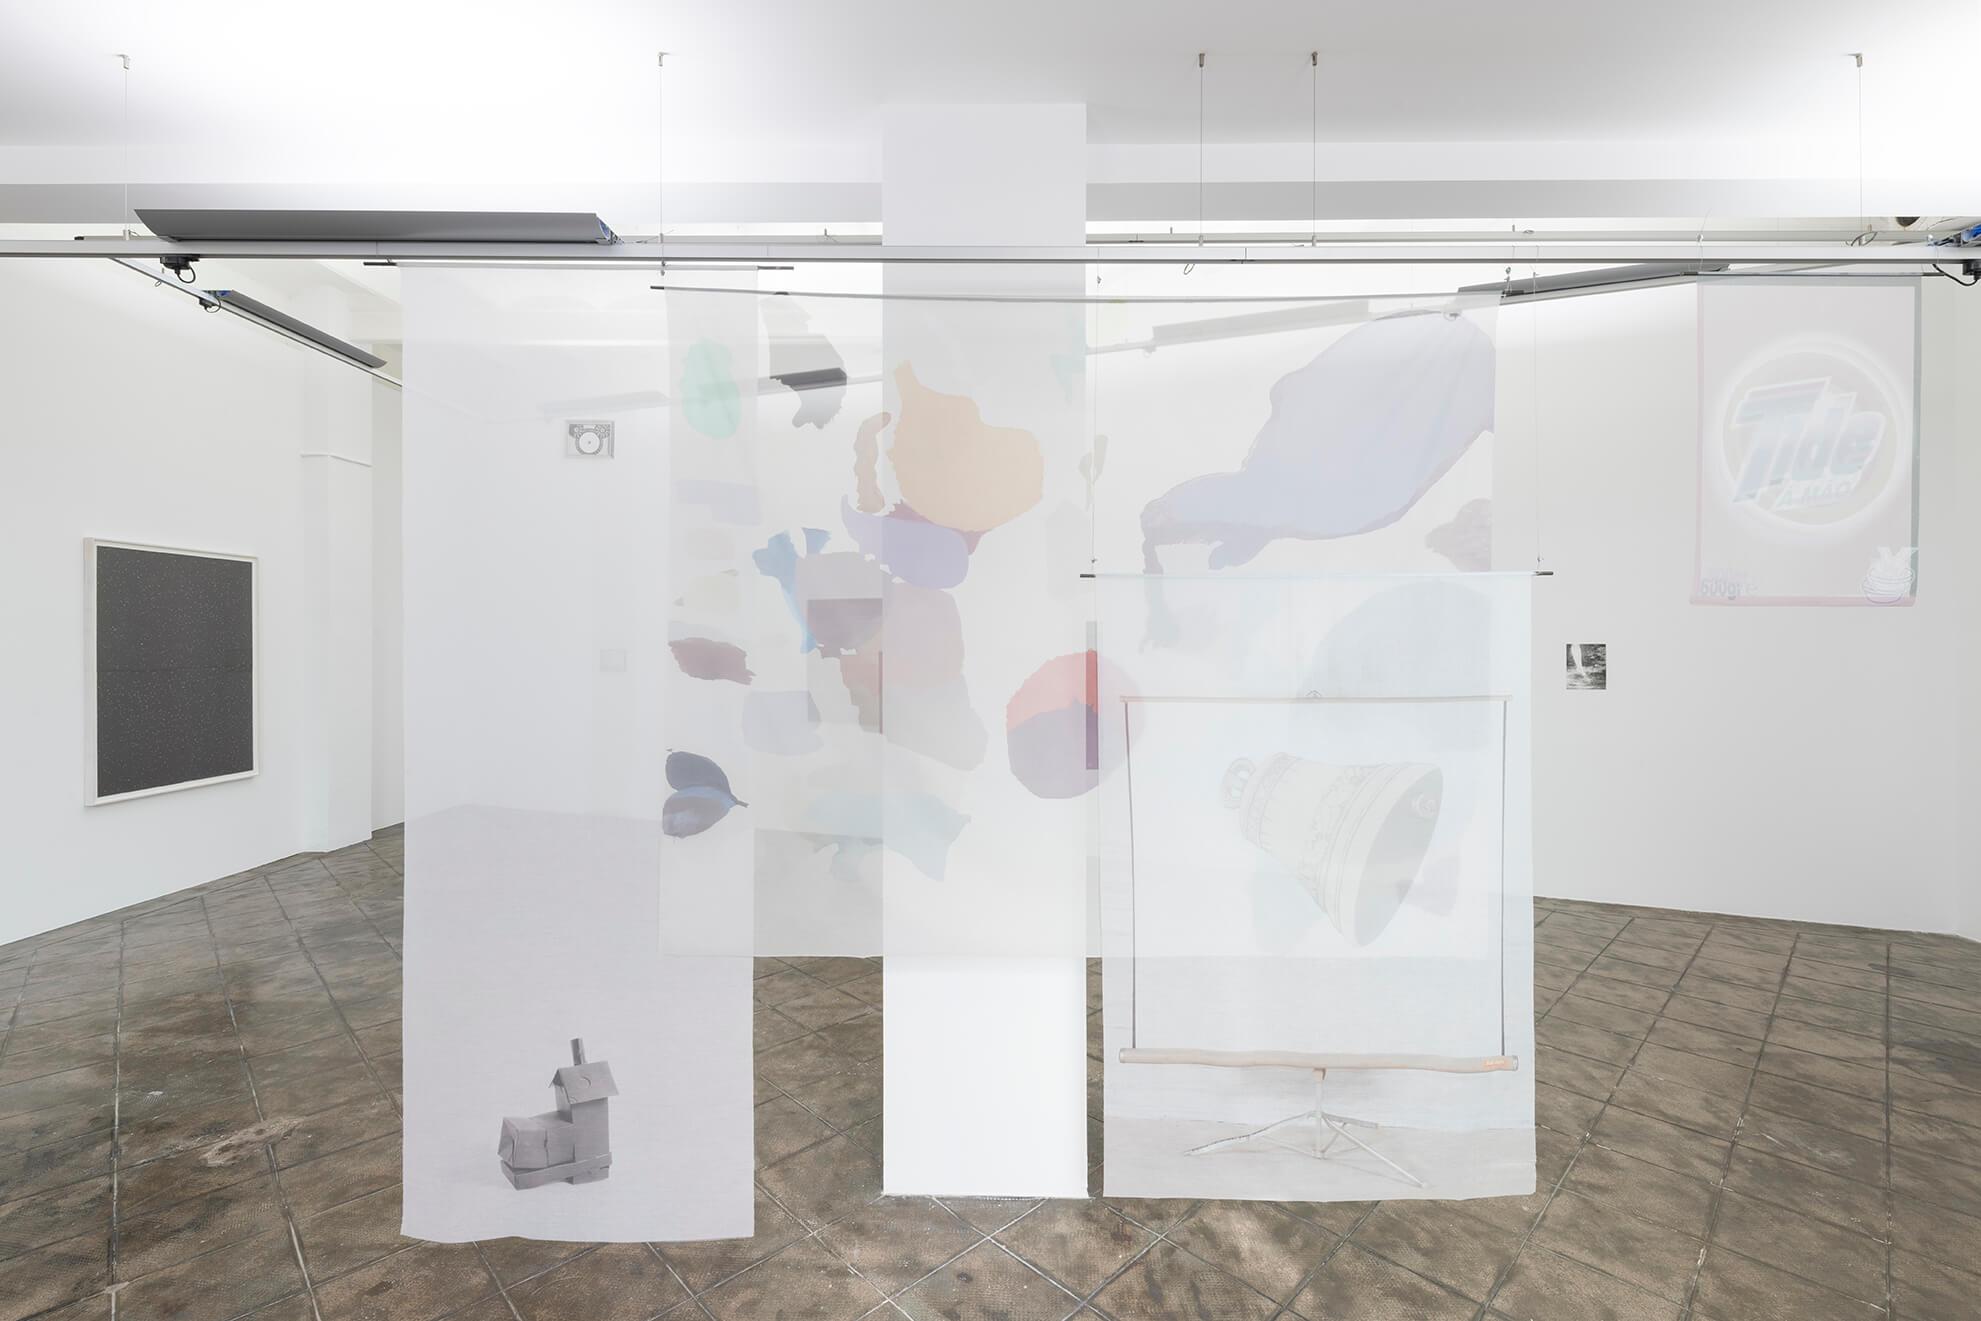 ANA JOTTA. Luxurious taste of Nothing, 2020 | El Museu Imaginari / El Museo Imaginario / The Imaginary Museum | ProjecteSD